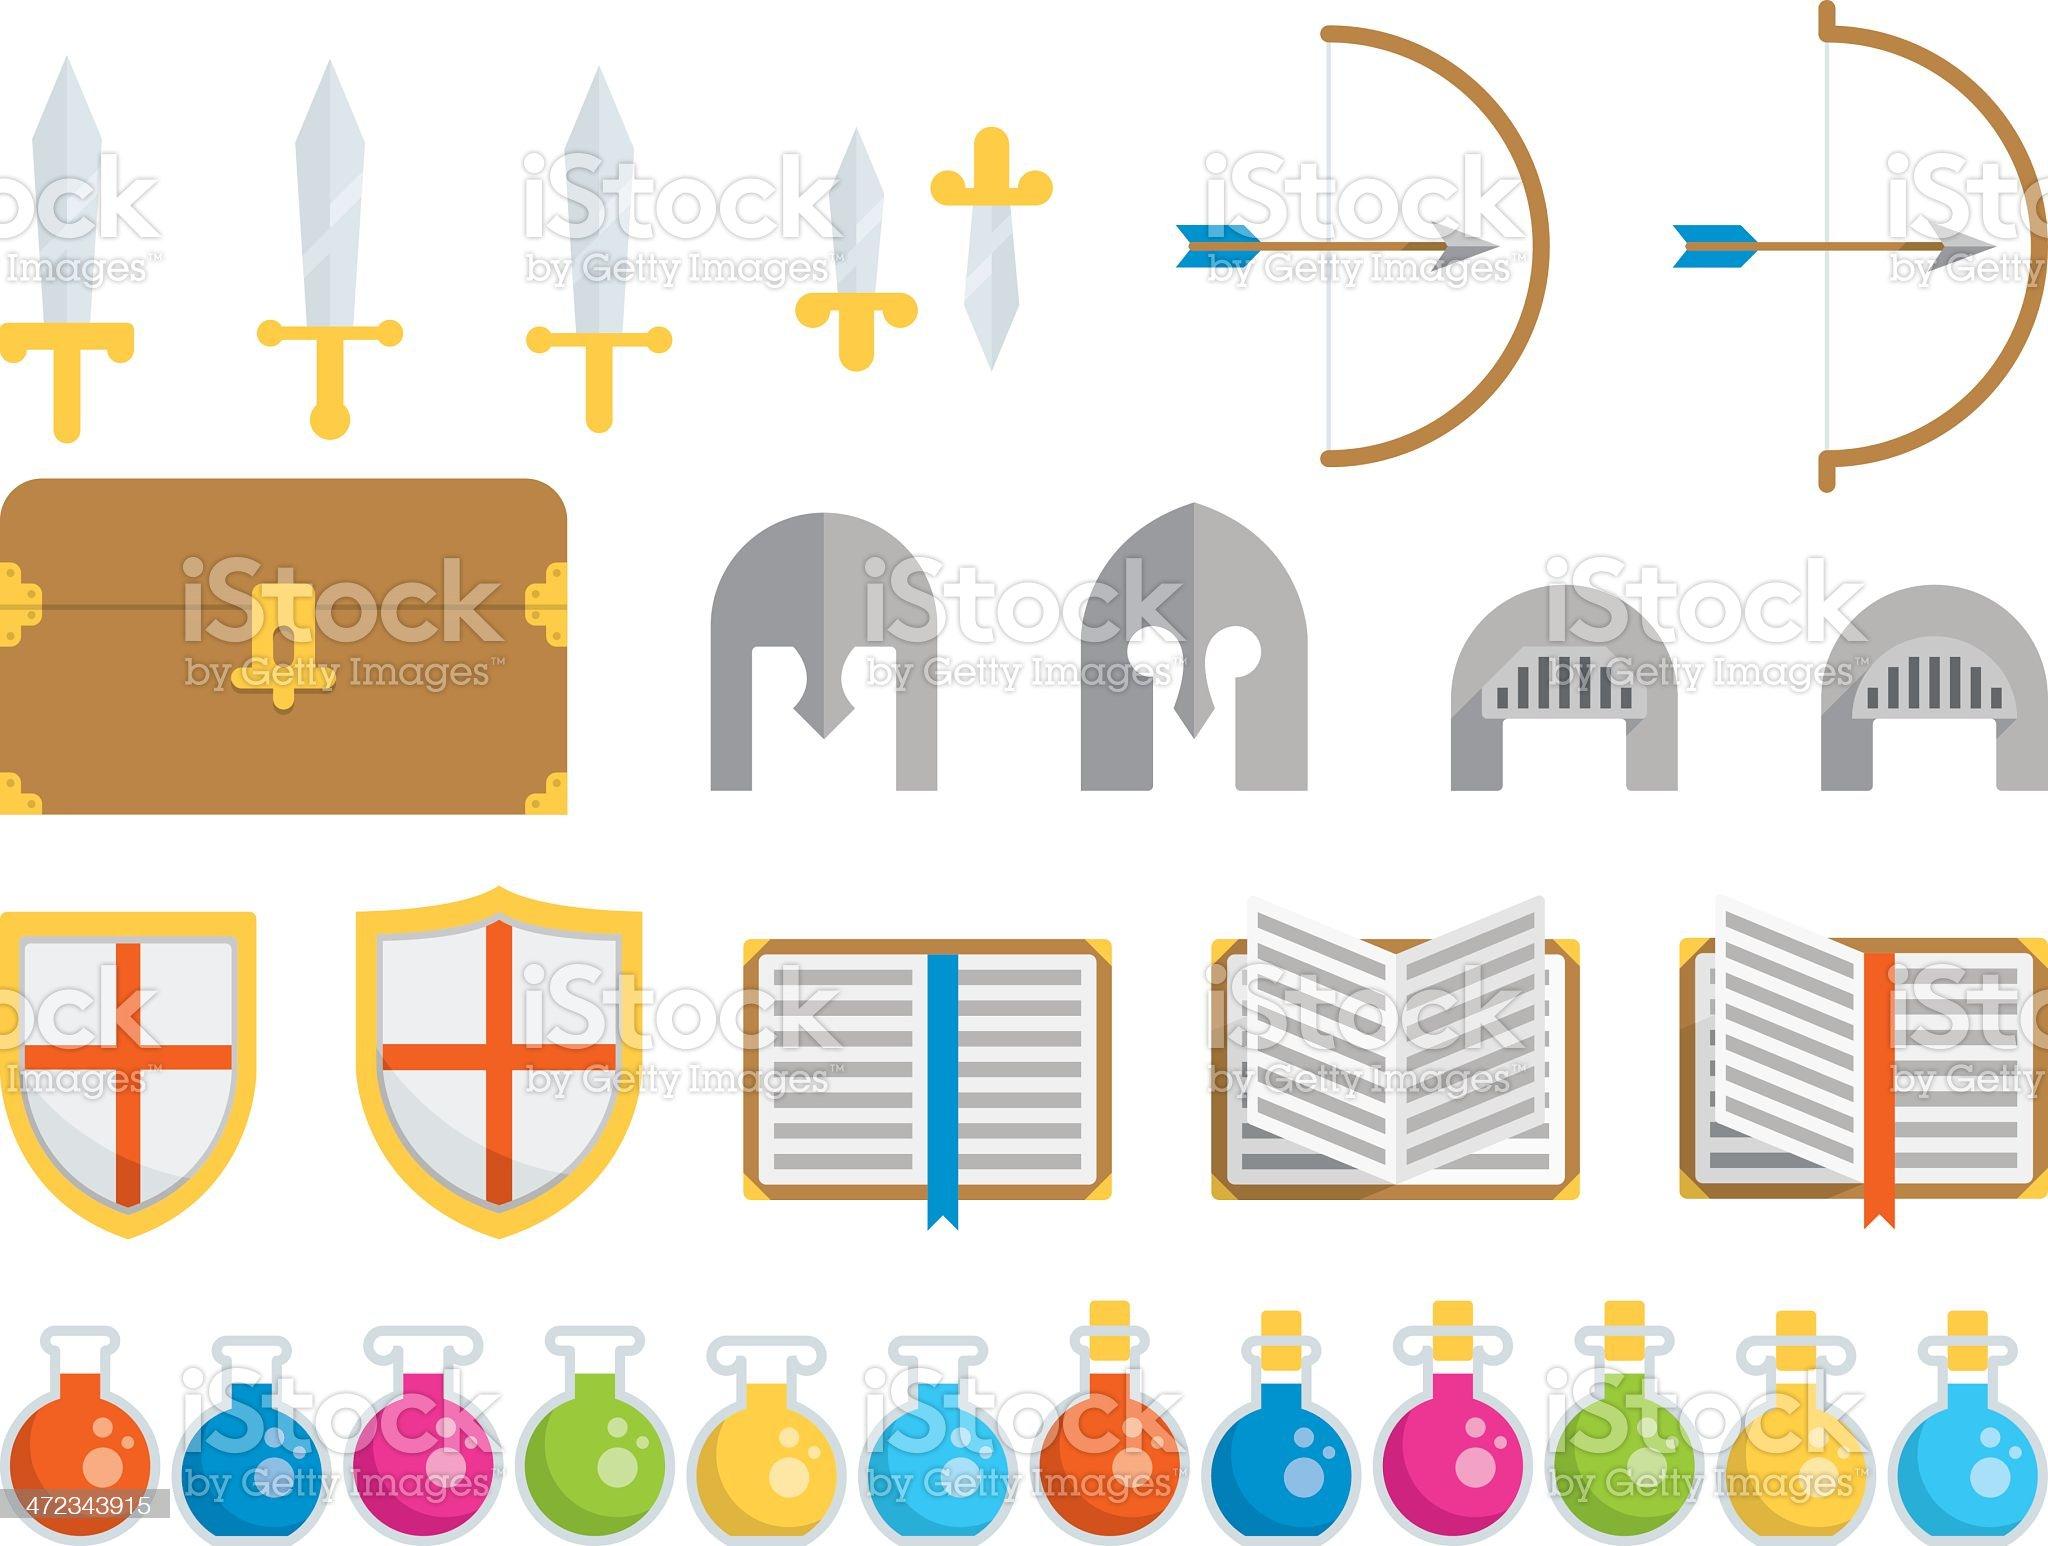 Set of Icons - Fantasy royalty-free stock vector art